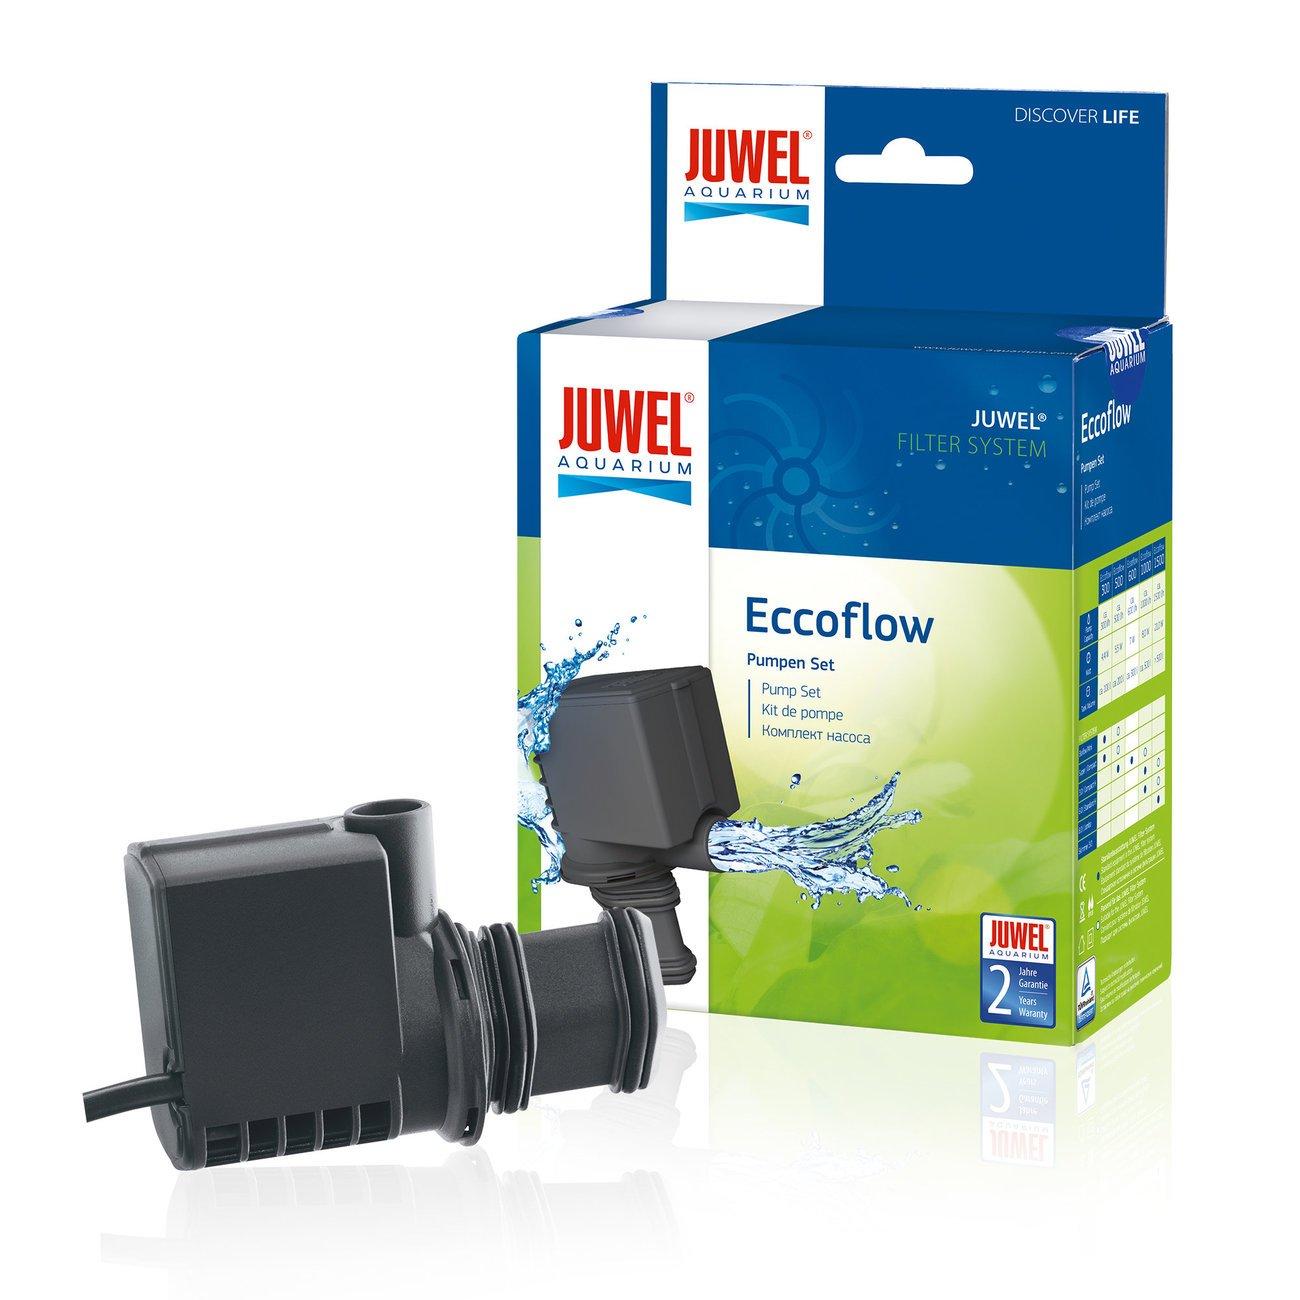 JUWEL Eccoflow Pumpen, Pumpe Eccoflow 1000 l/h